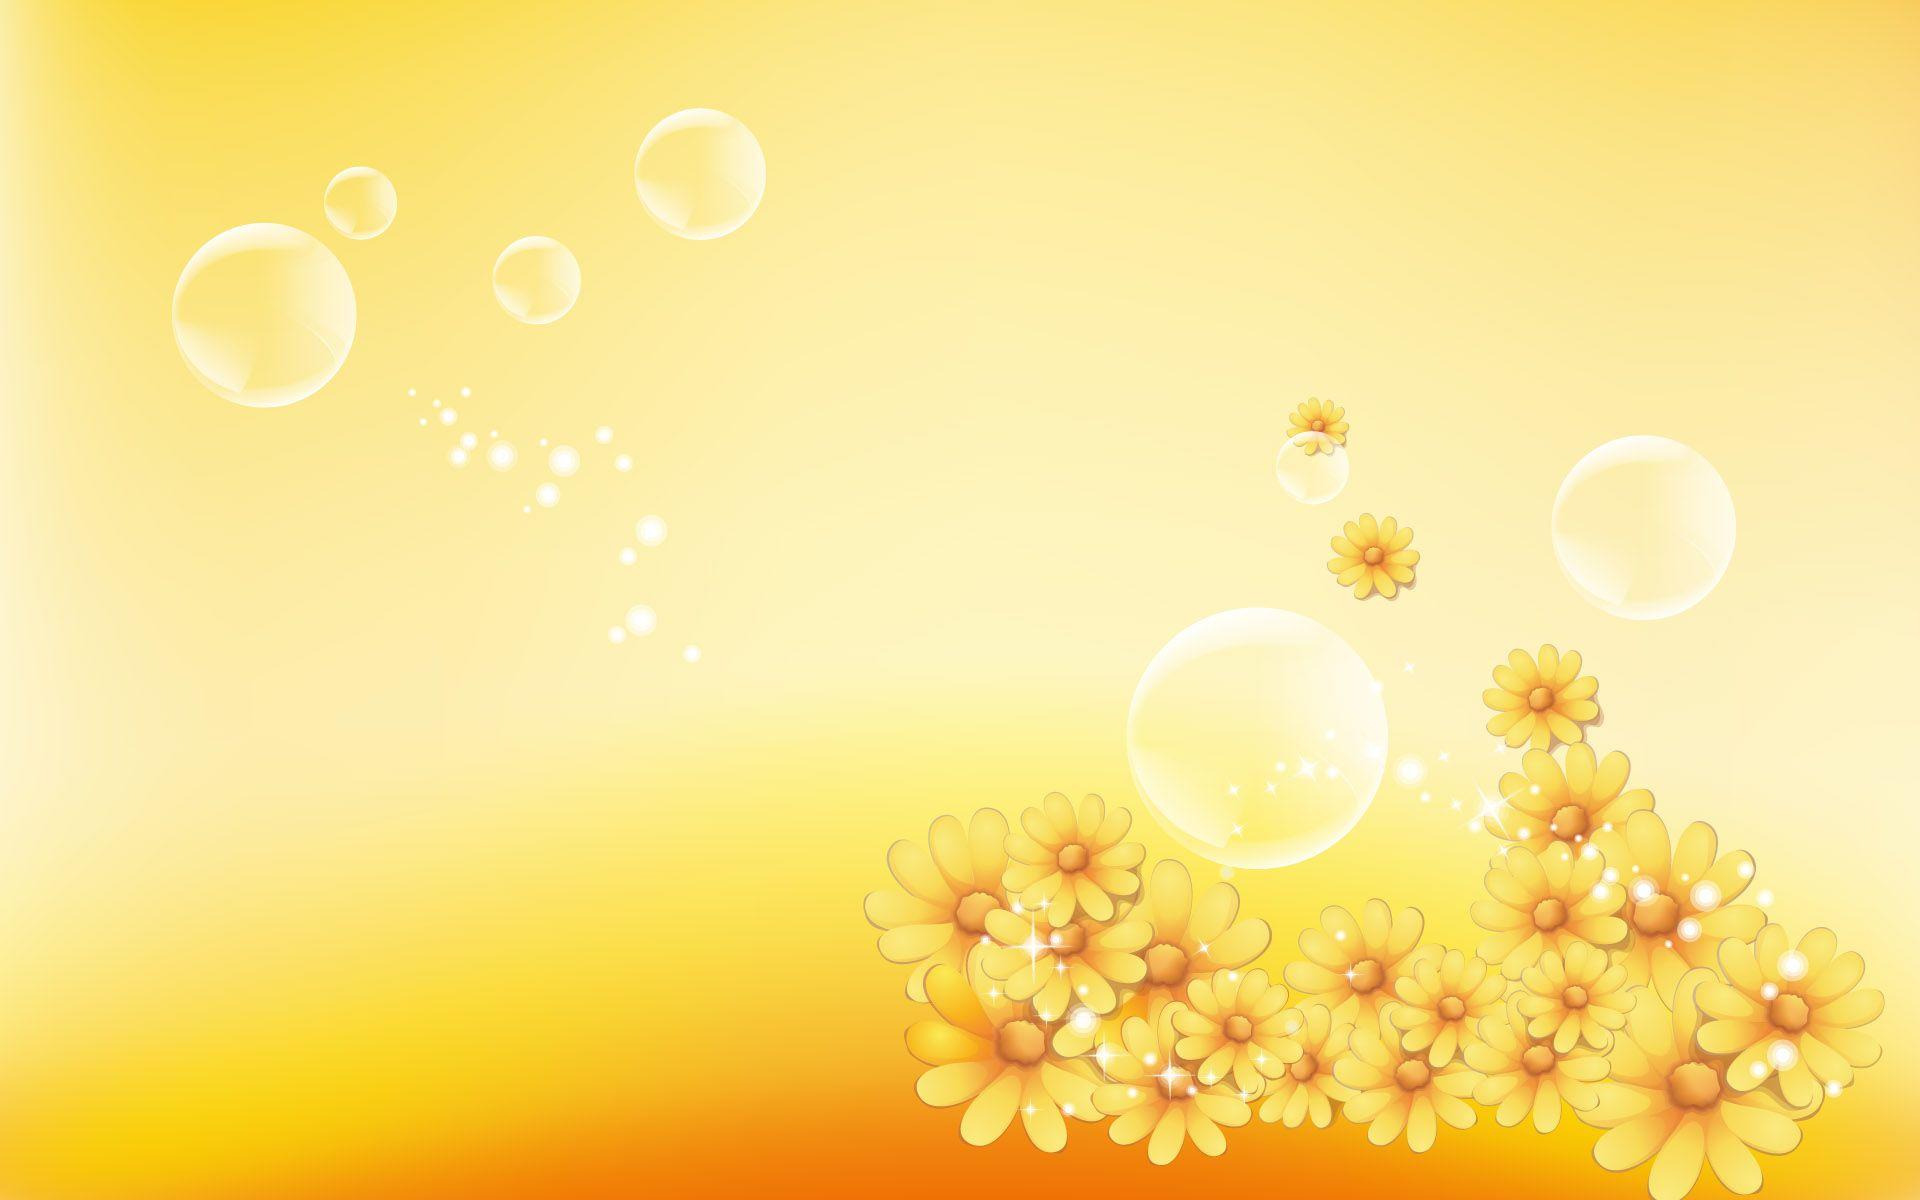 Hd wallpaper yellow flowers - Orange Desktop Background Bubbles And Flowers Misc Stuff Wallpapers Hd Wallpaper Download